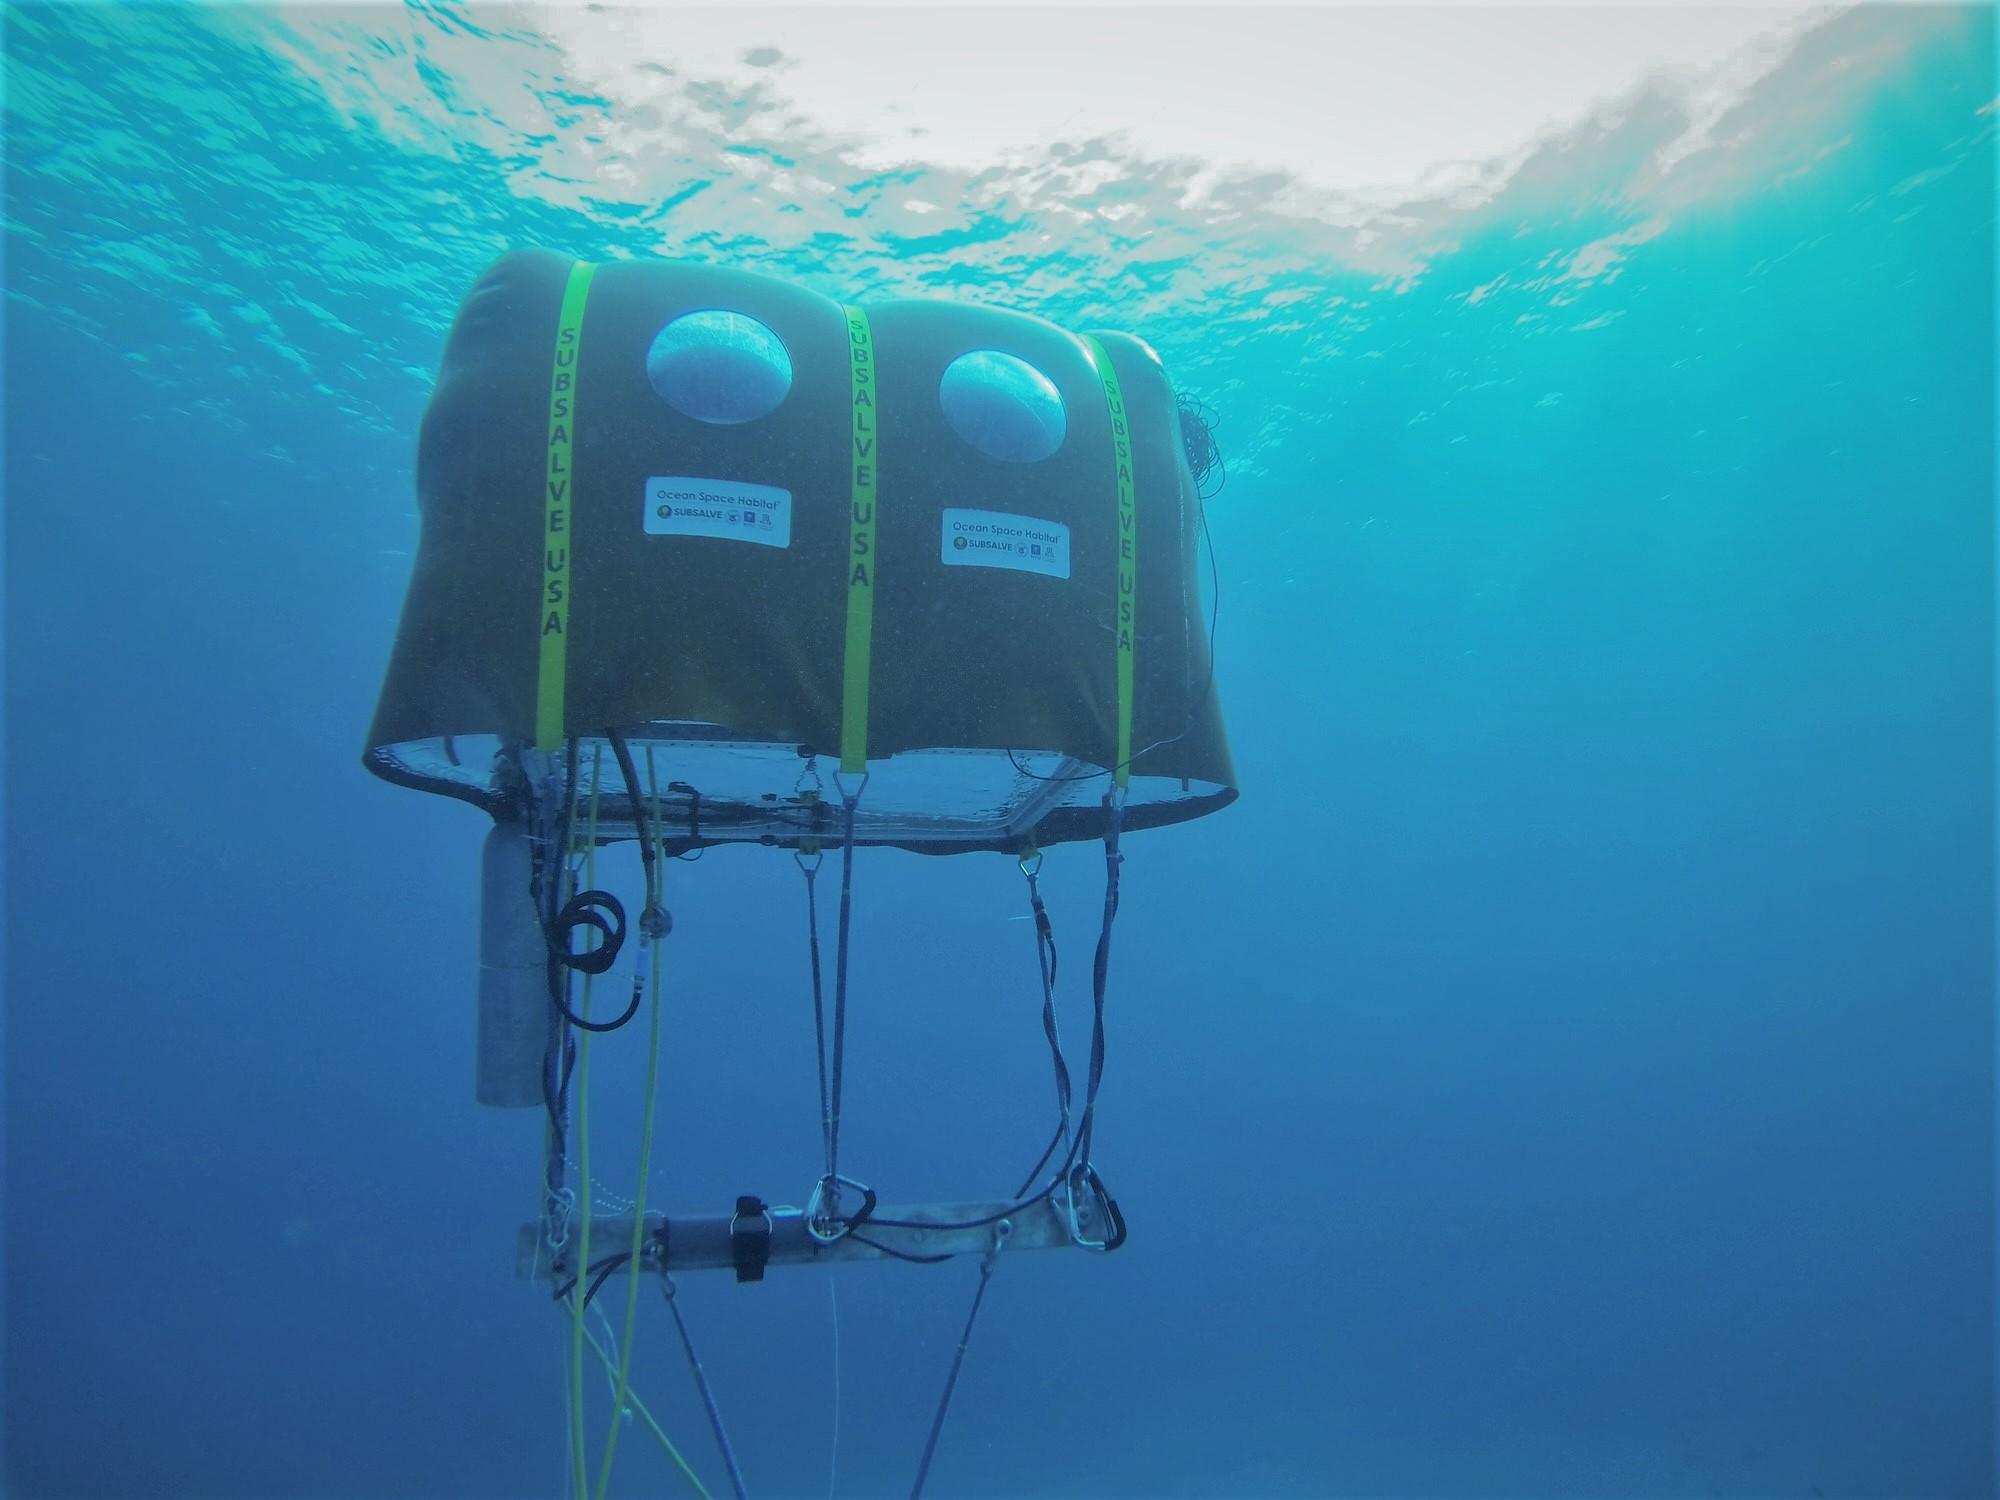 UArizona Professor's Underwater Tent Invention to Appear on Shark Week